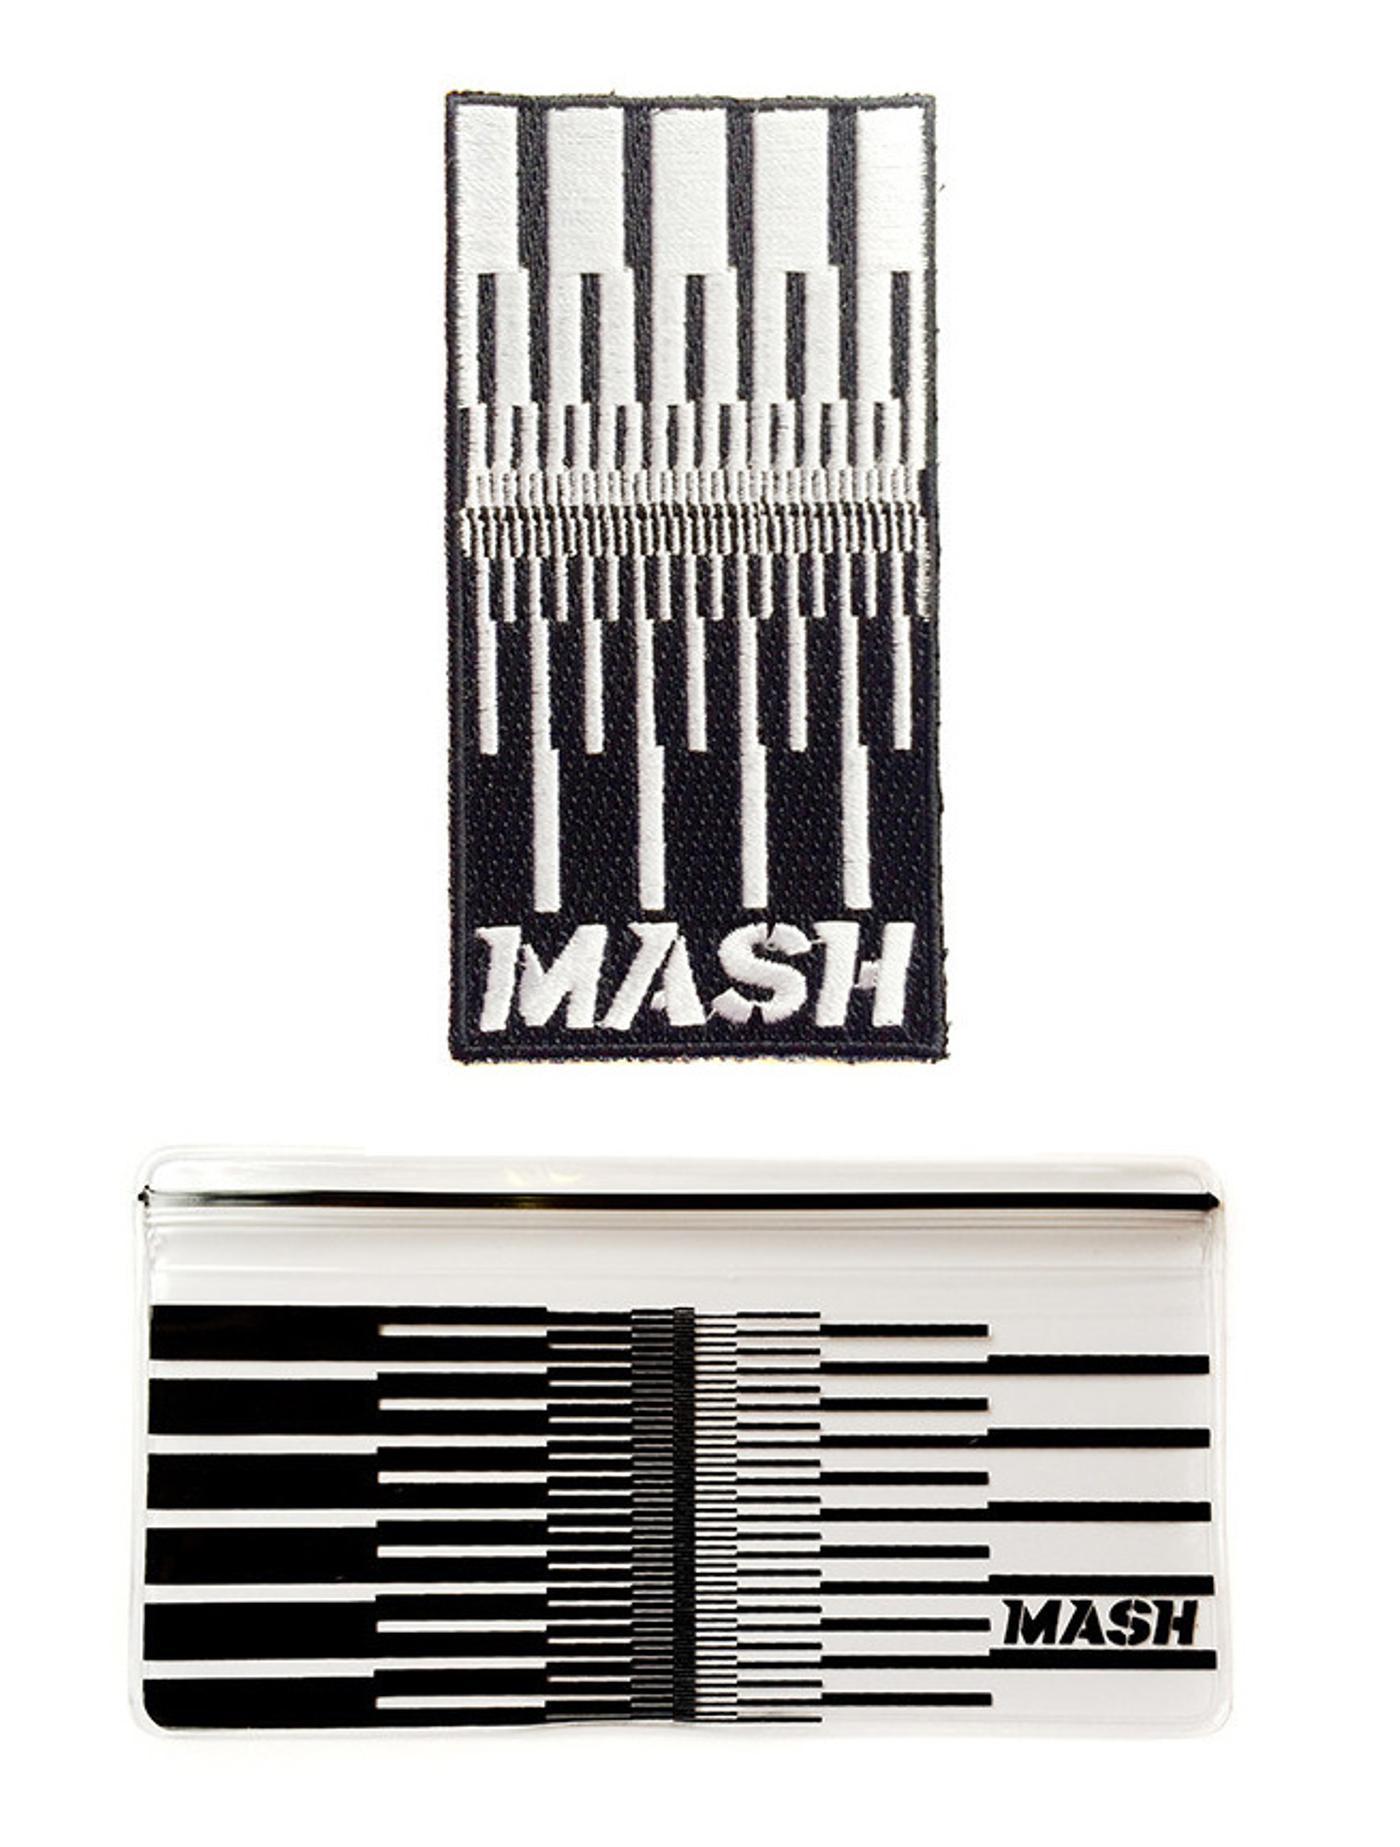 Mash: Paralax Products